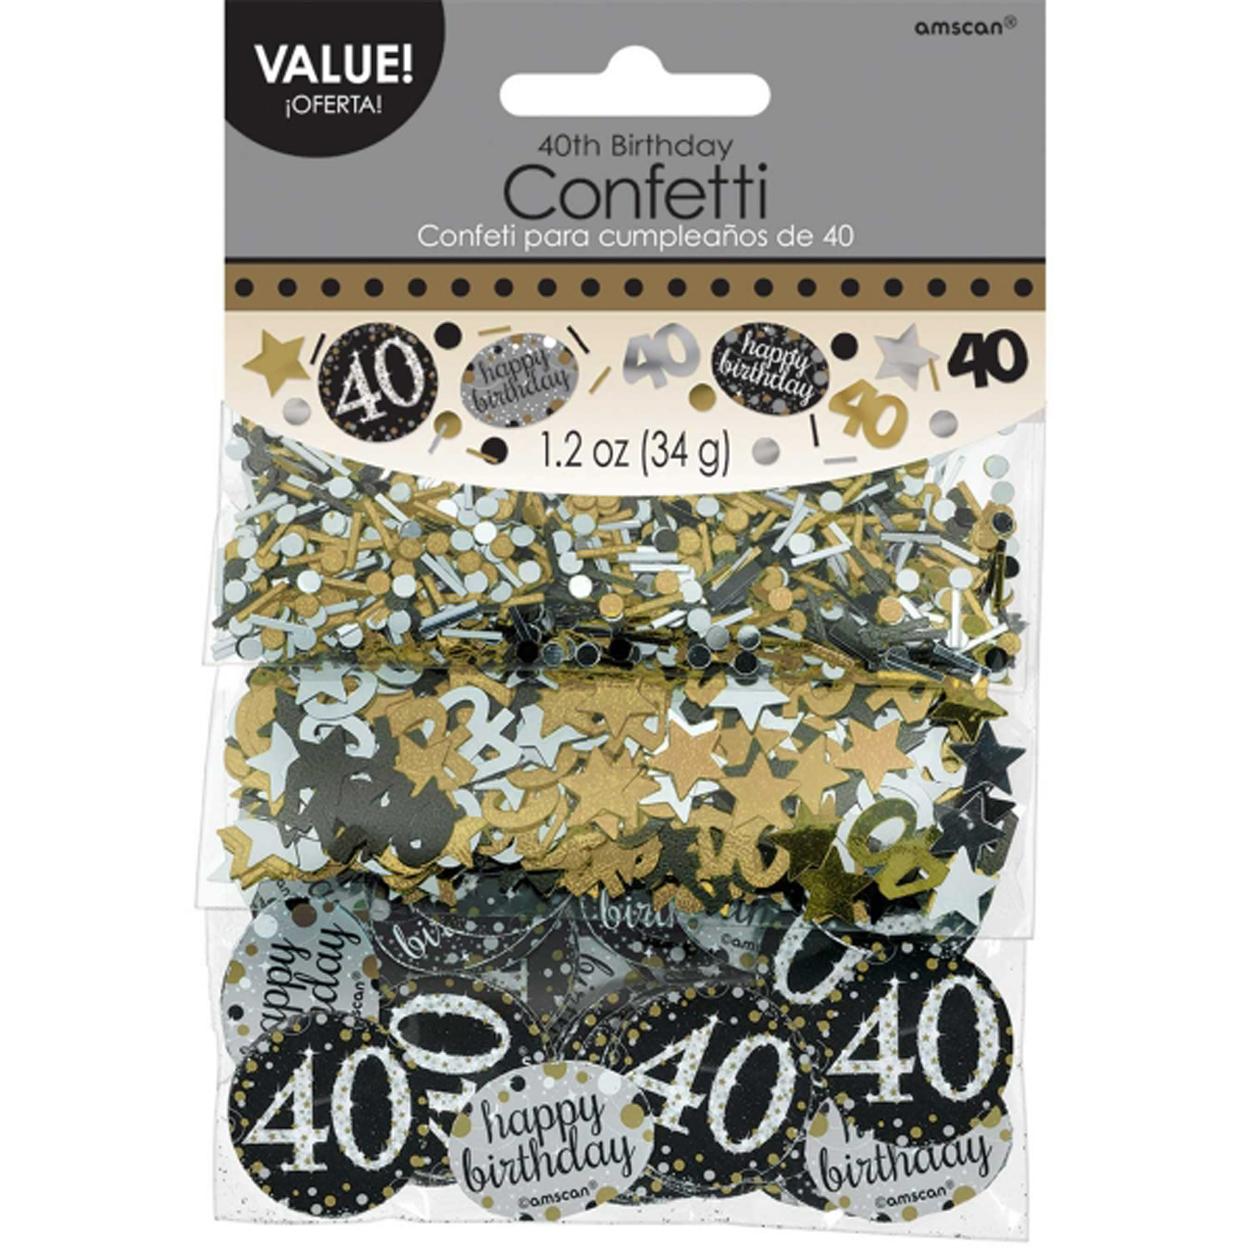 40th Birthday Confetti Table Decoration Sprinkle Black